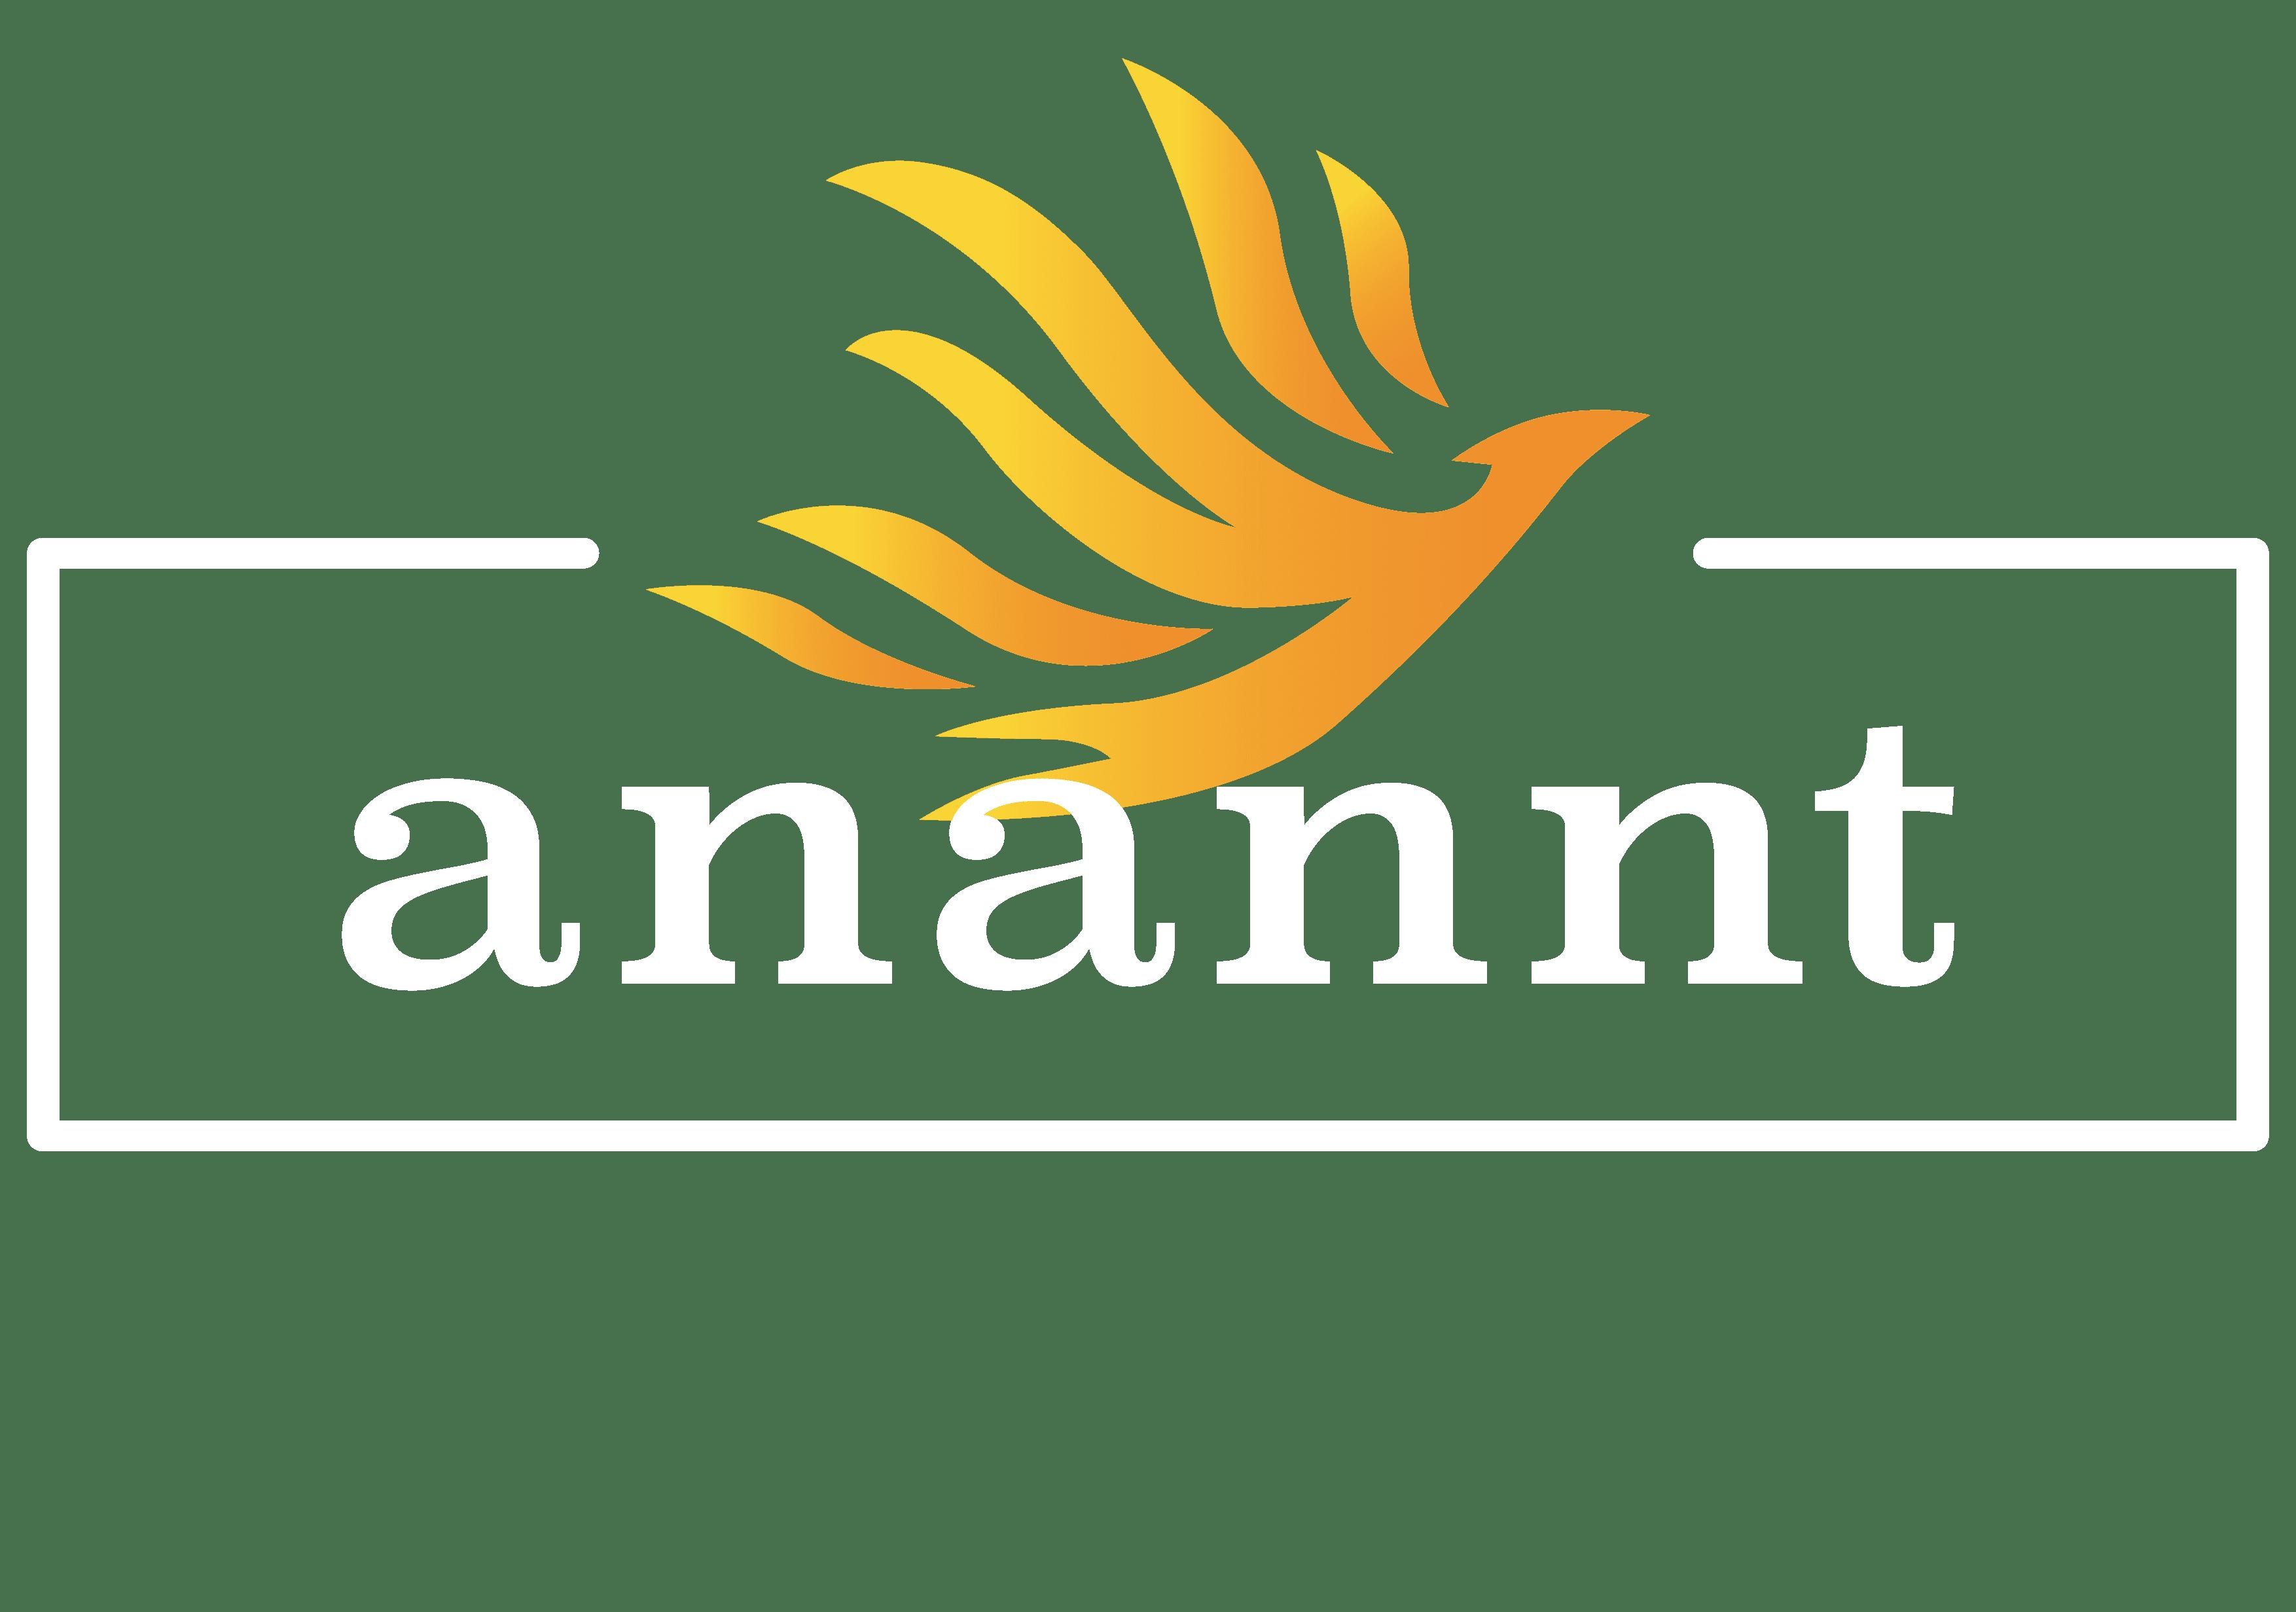 Anannt Education